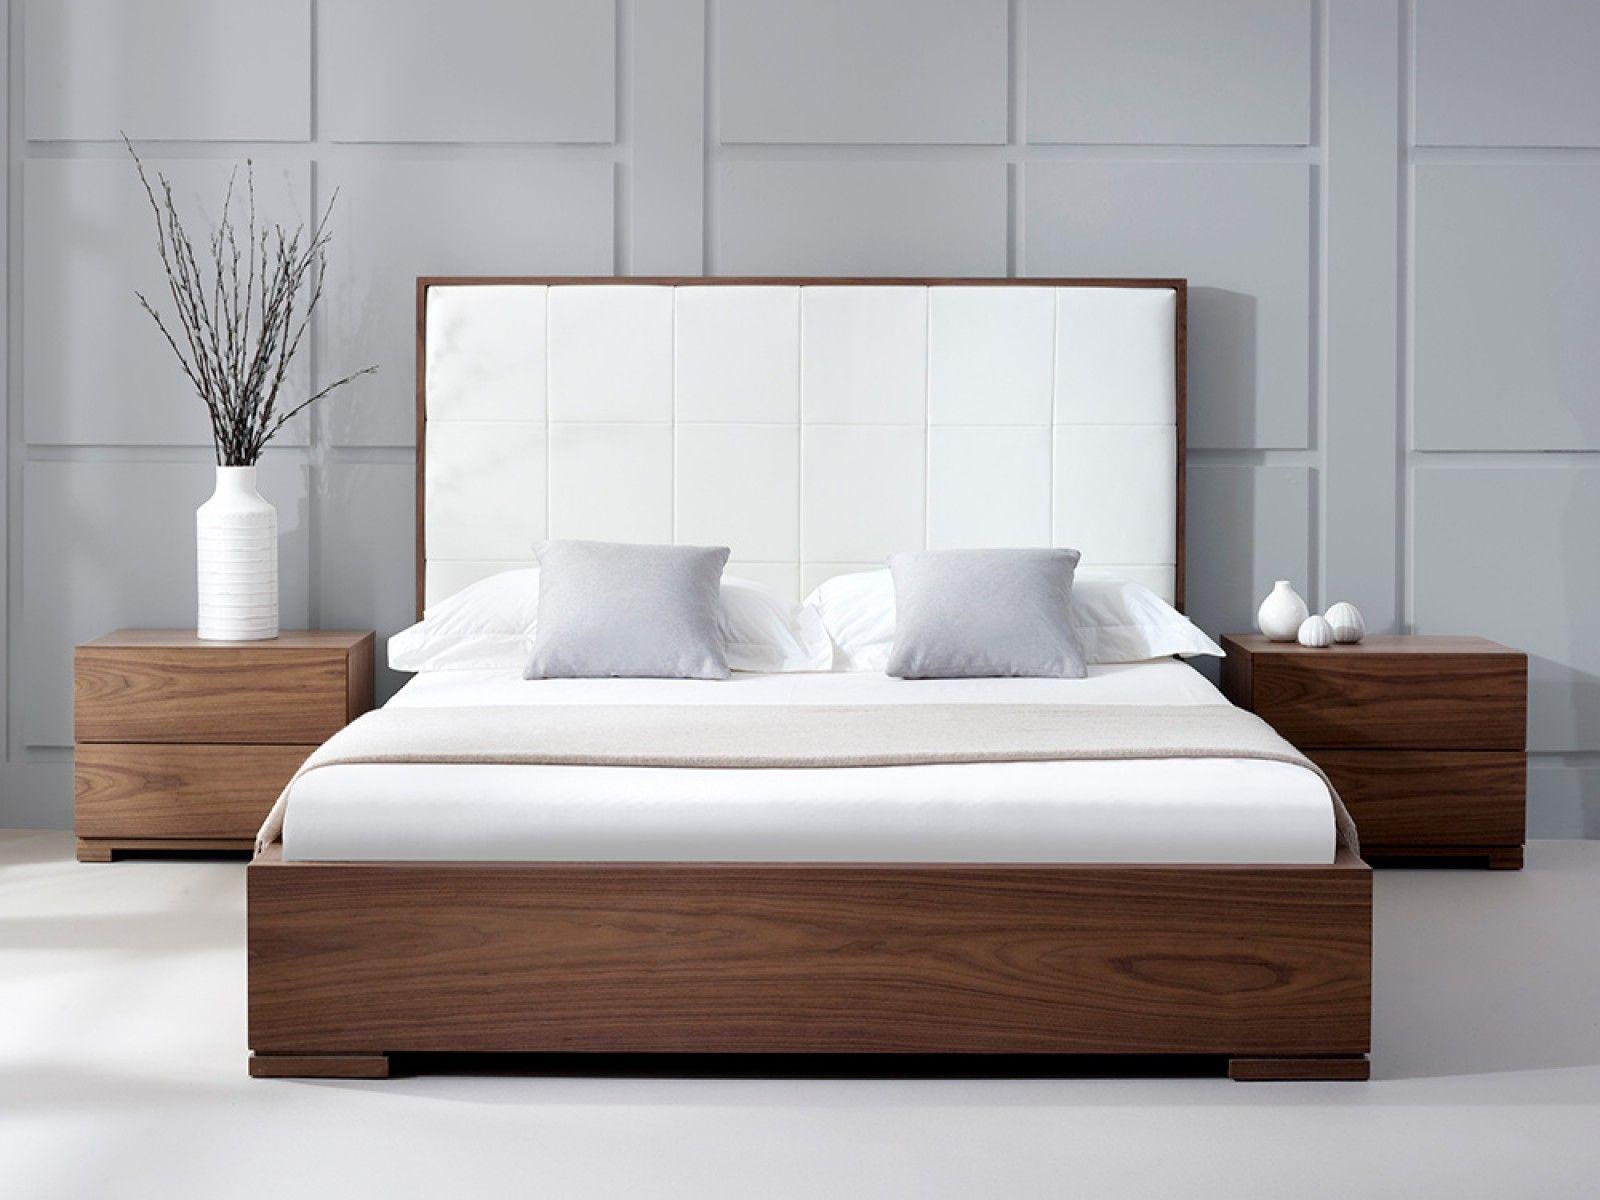 Bella Natural Walnut Bed Bathroom Mirrors In 2019 Modern